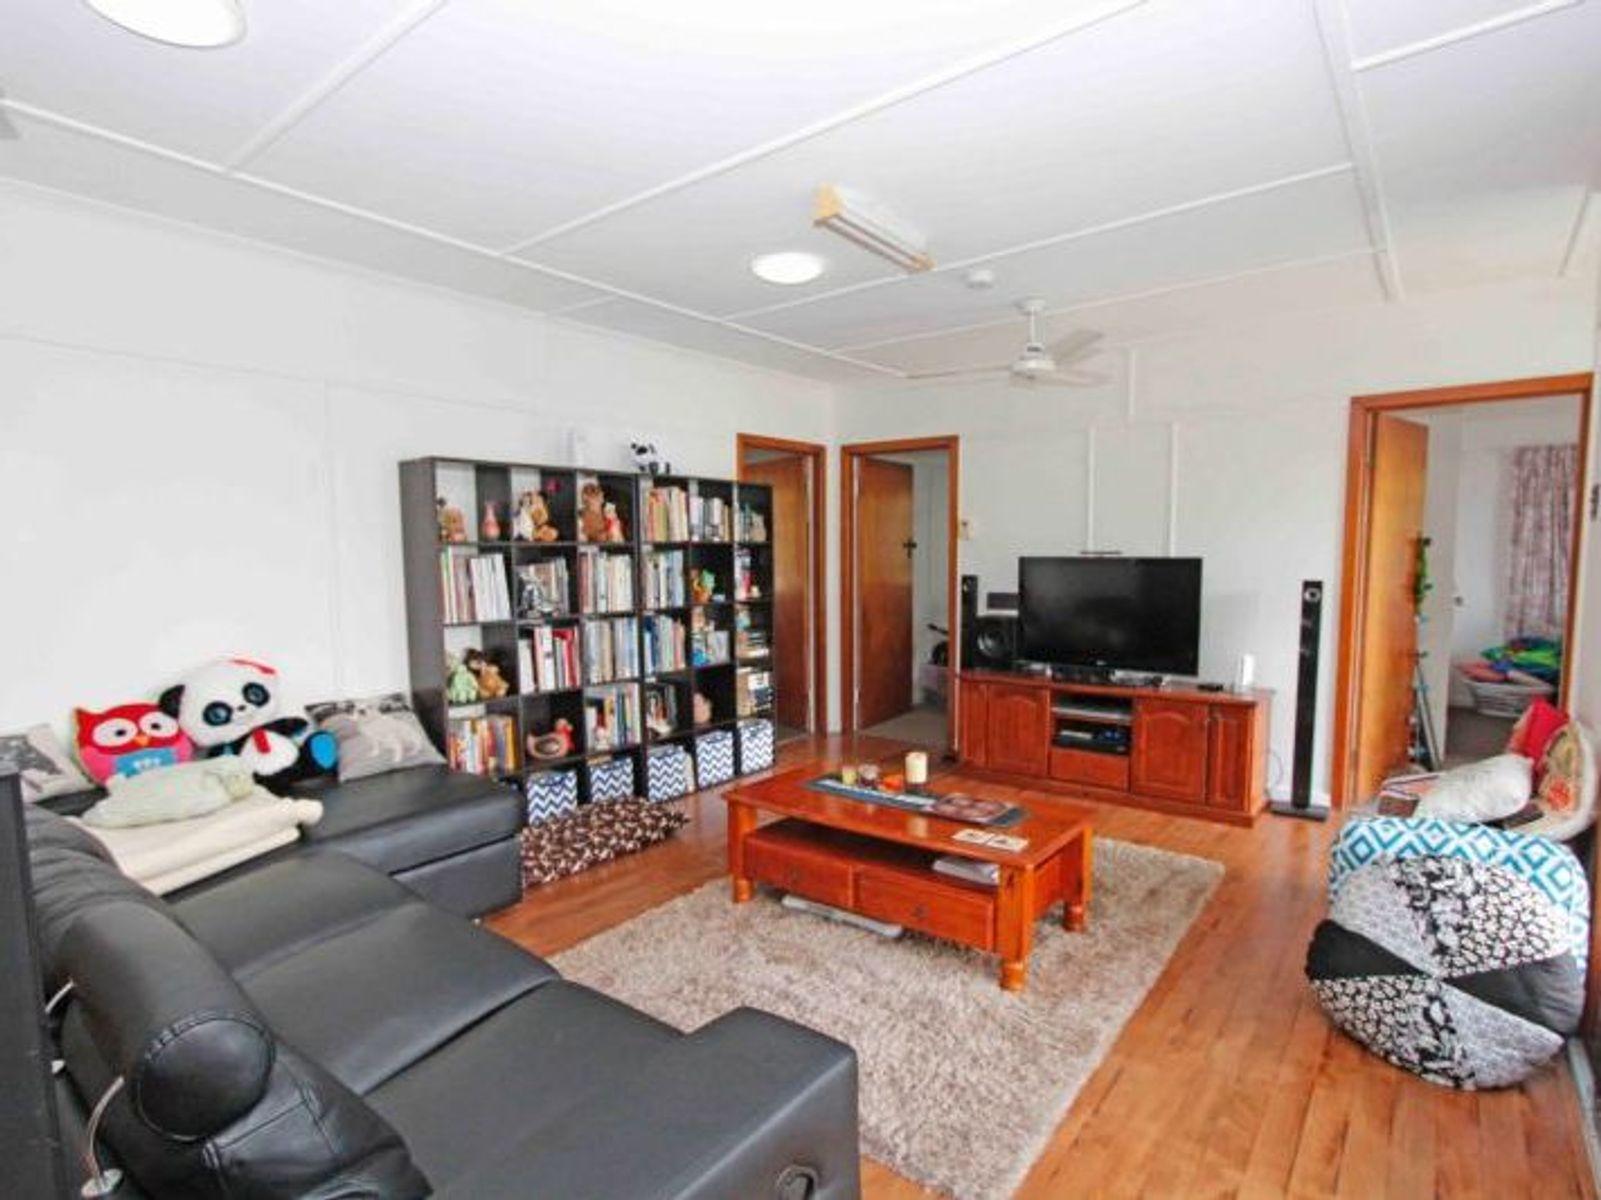 3 George Street, Nambour, QLD 4560